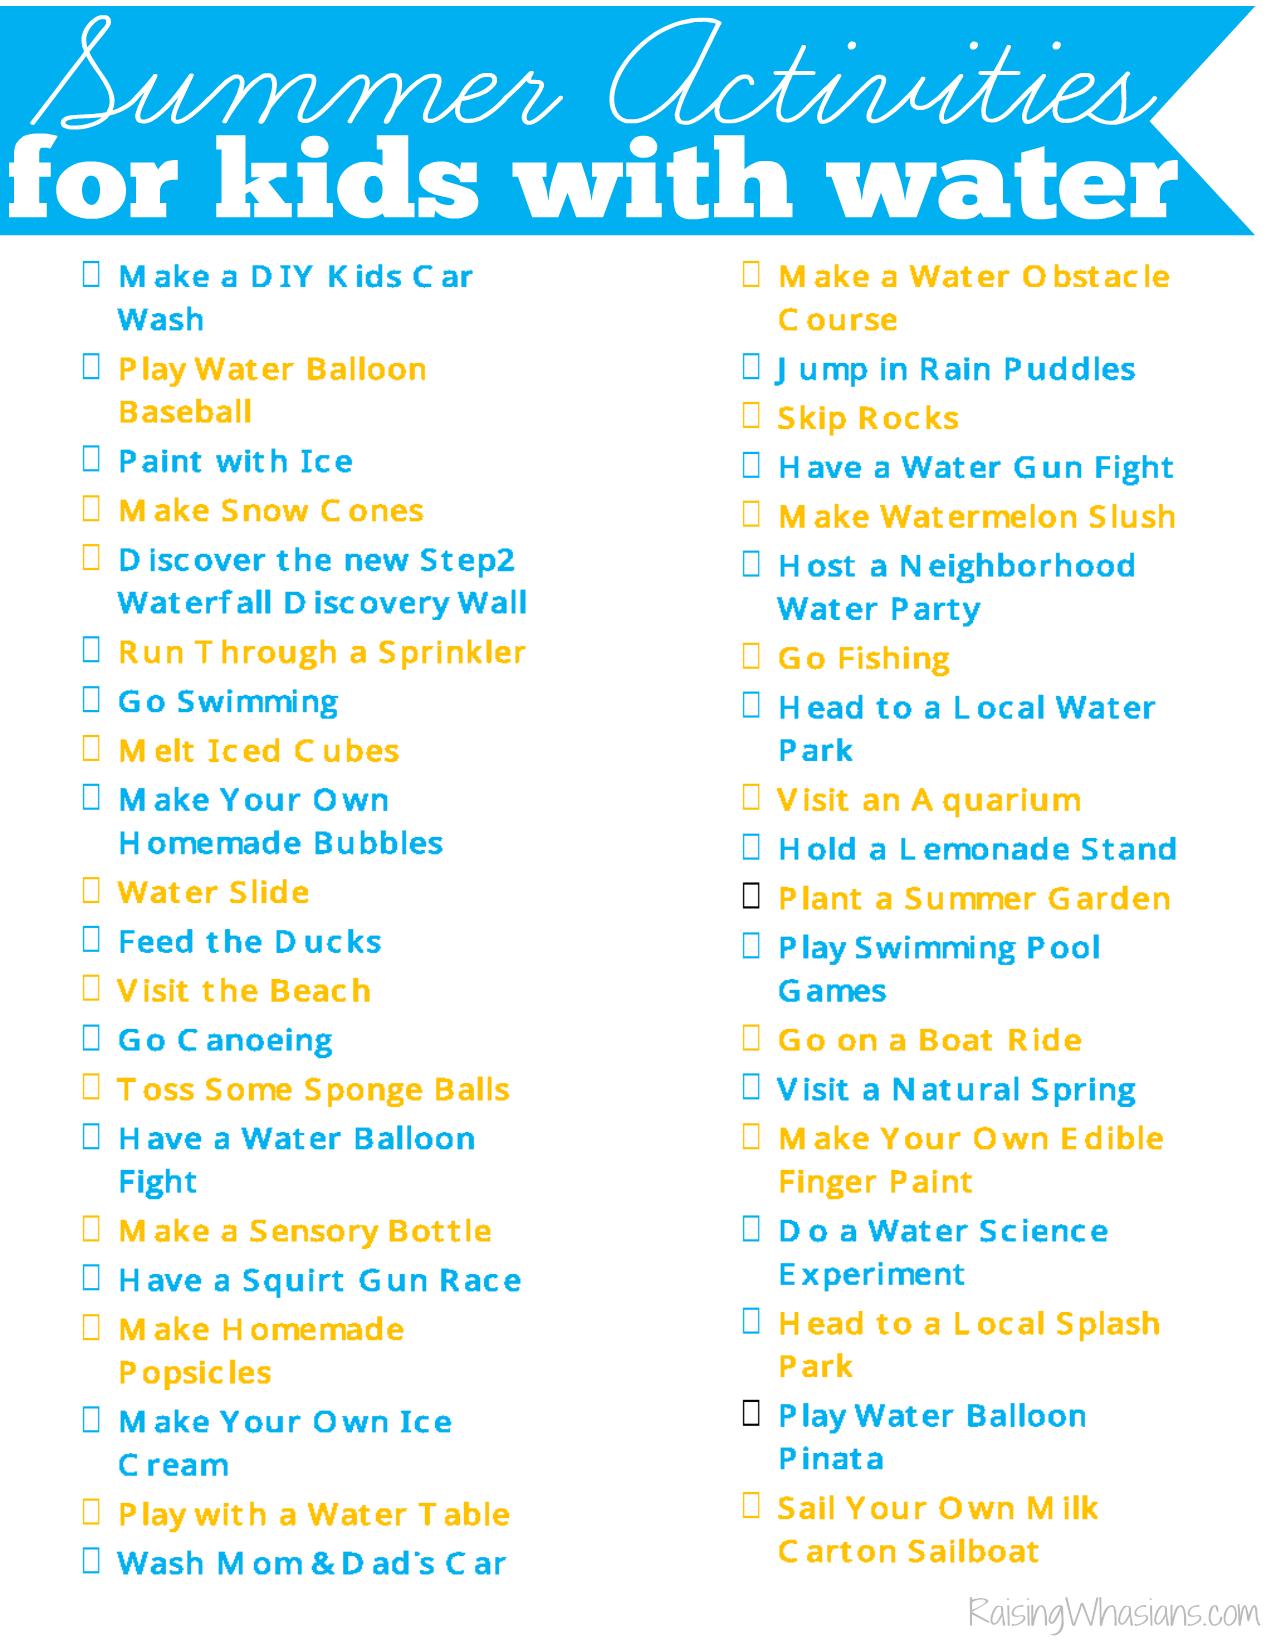 Summer activities for kids list printable